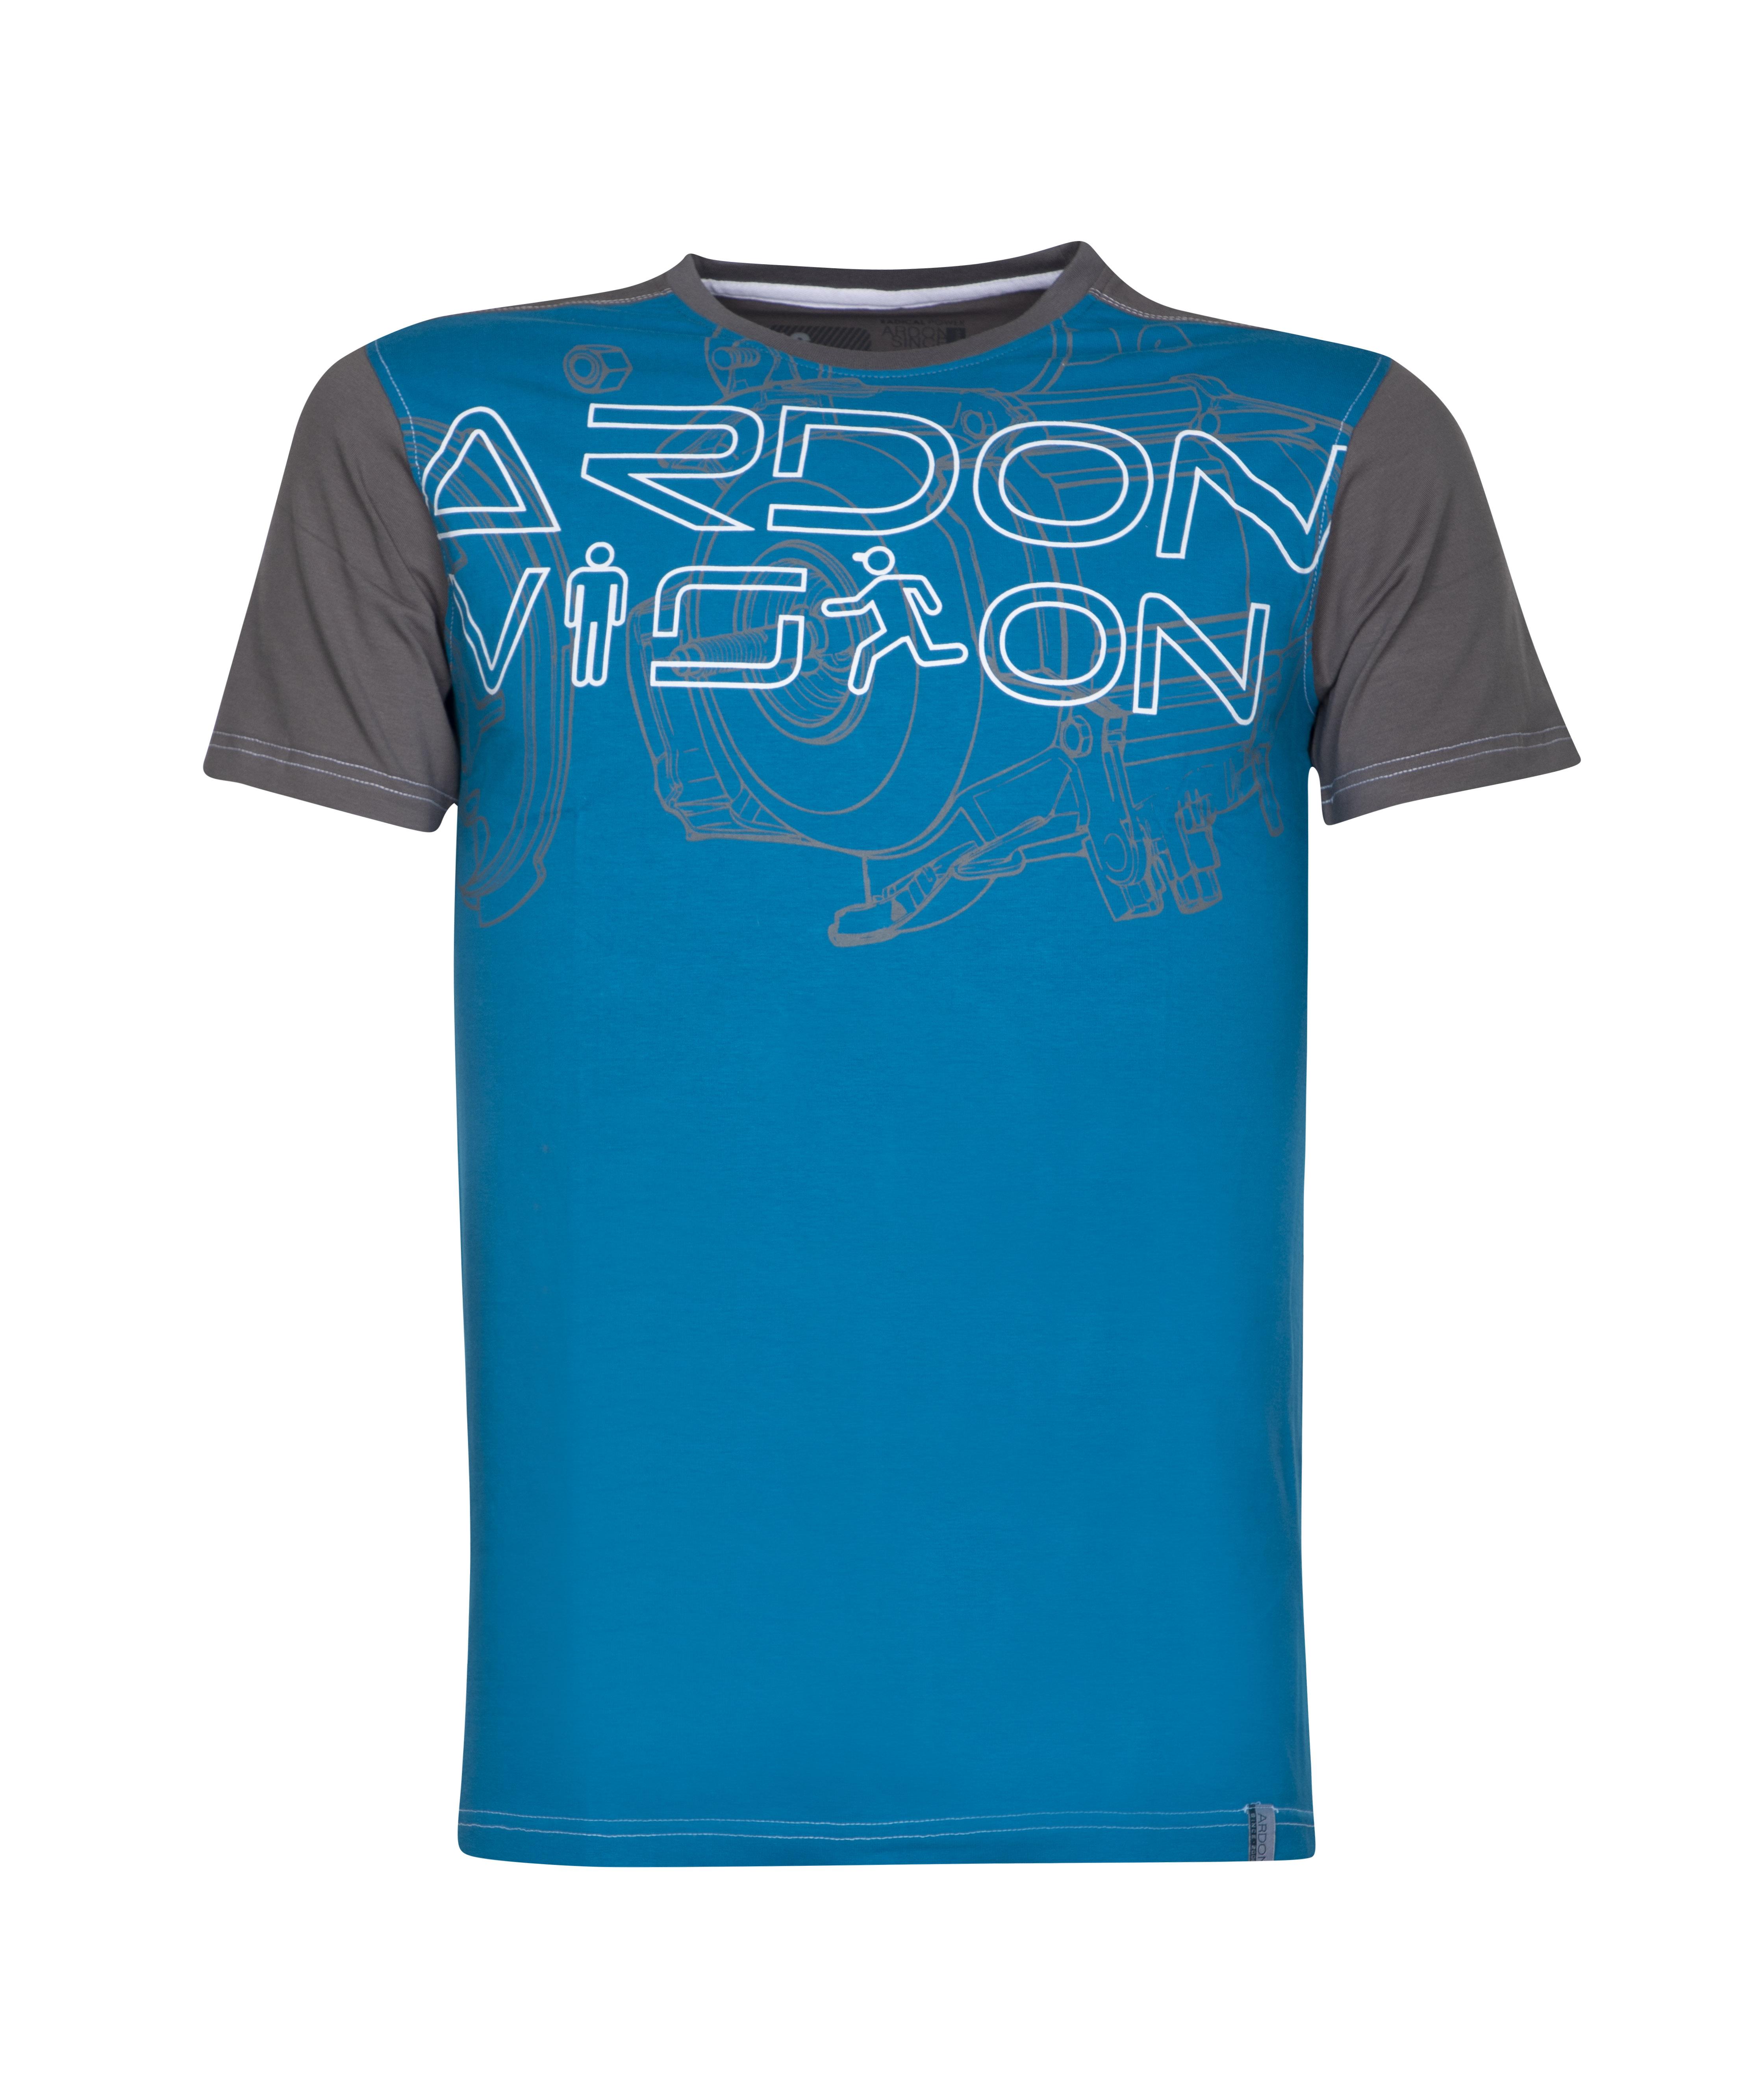 Triko VISION H9729 modré prac. L